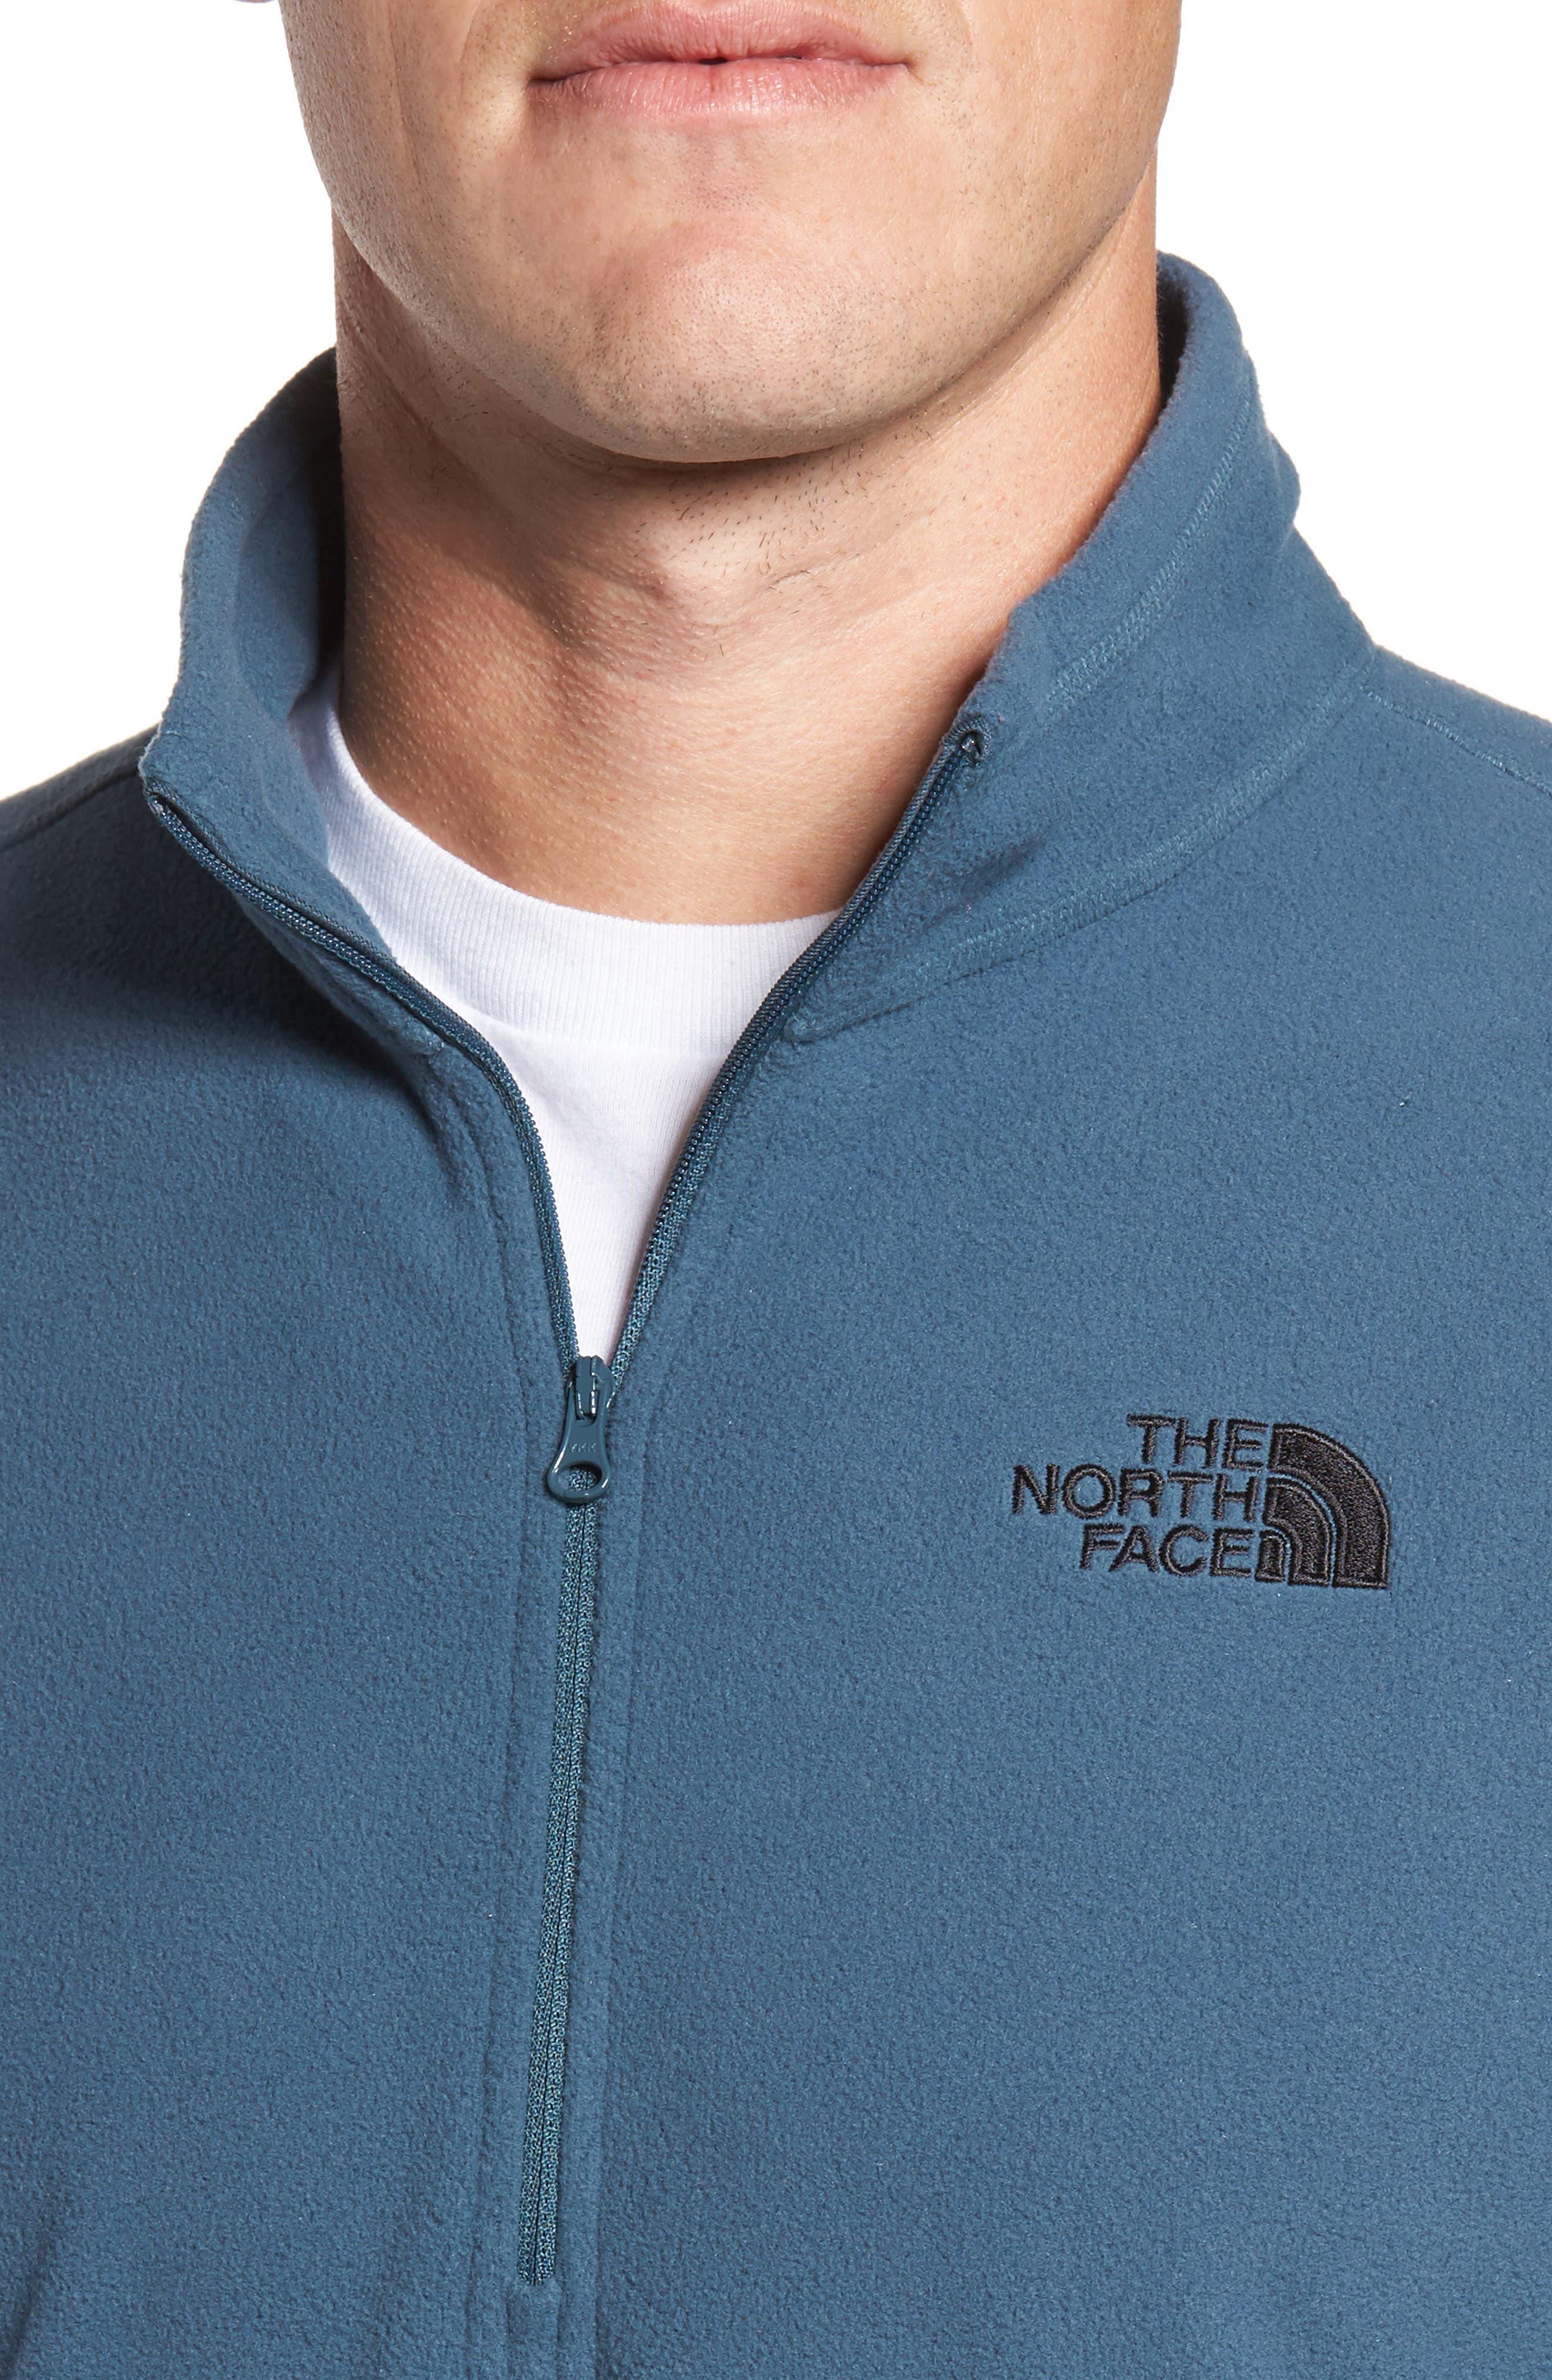 Alternate Image 4  - The North Face 'TKA 100 Glacier' Quarter Zip Fleece Pullover